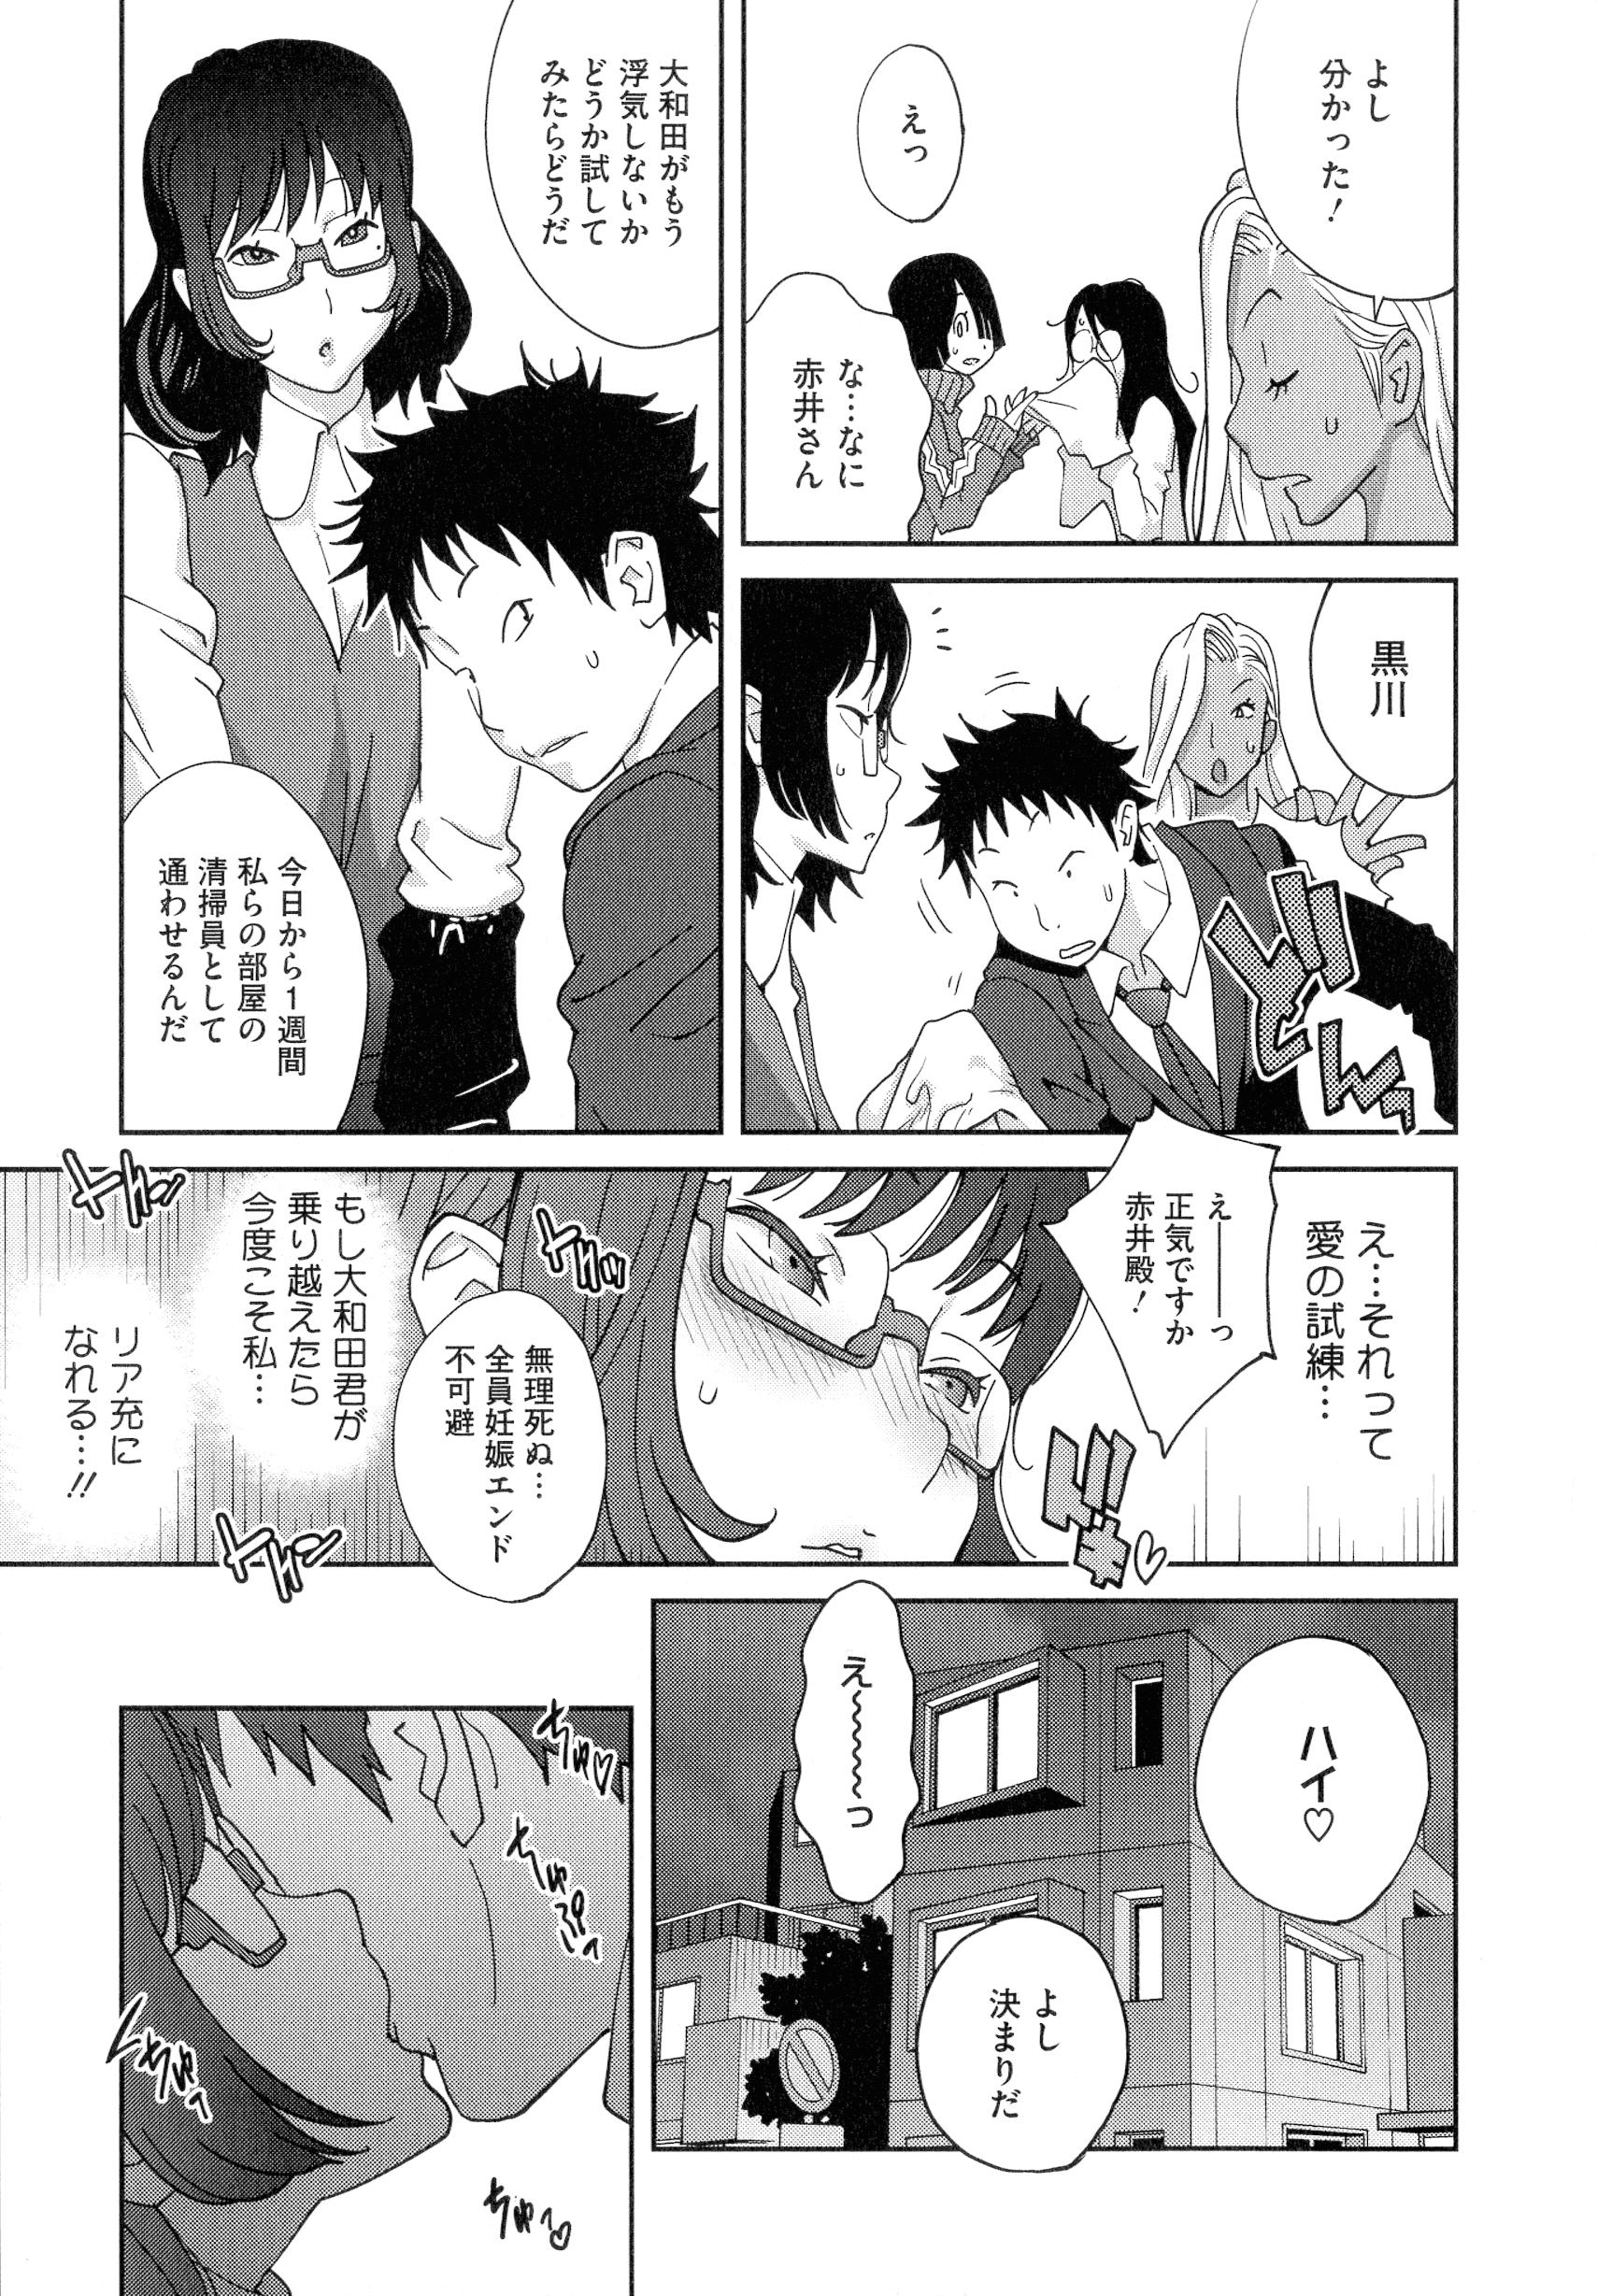 019 pg 17